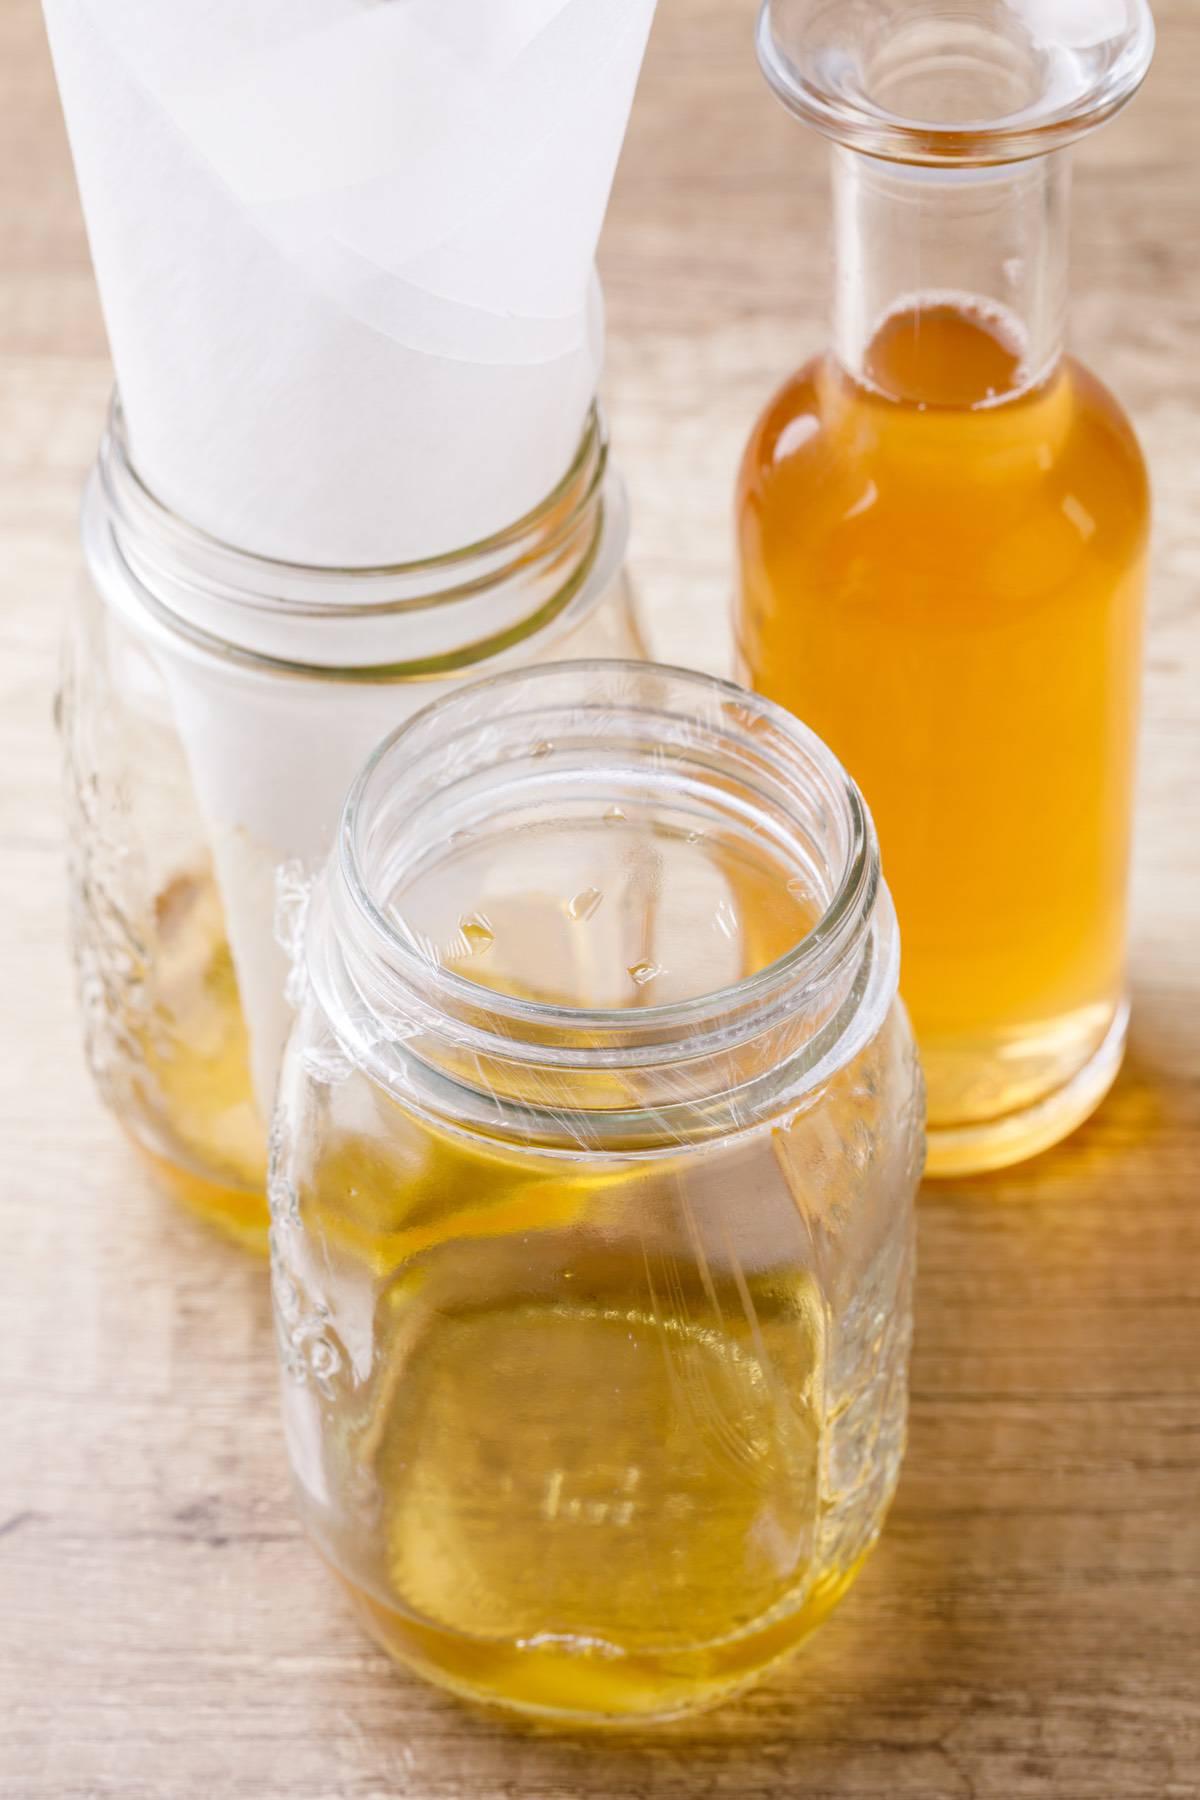 Apple Cider Vinegar Diy Fruit Fly Trap